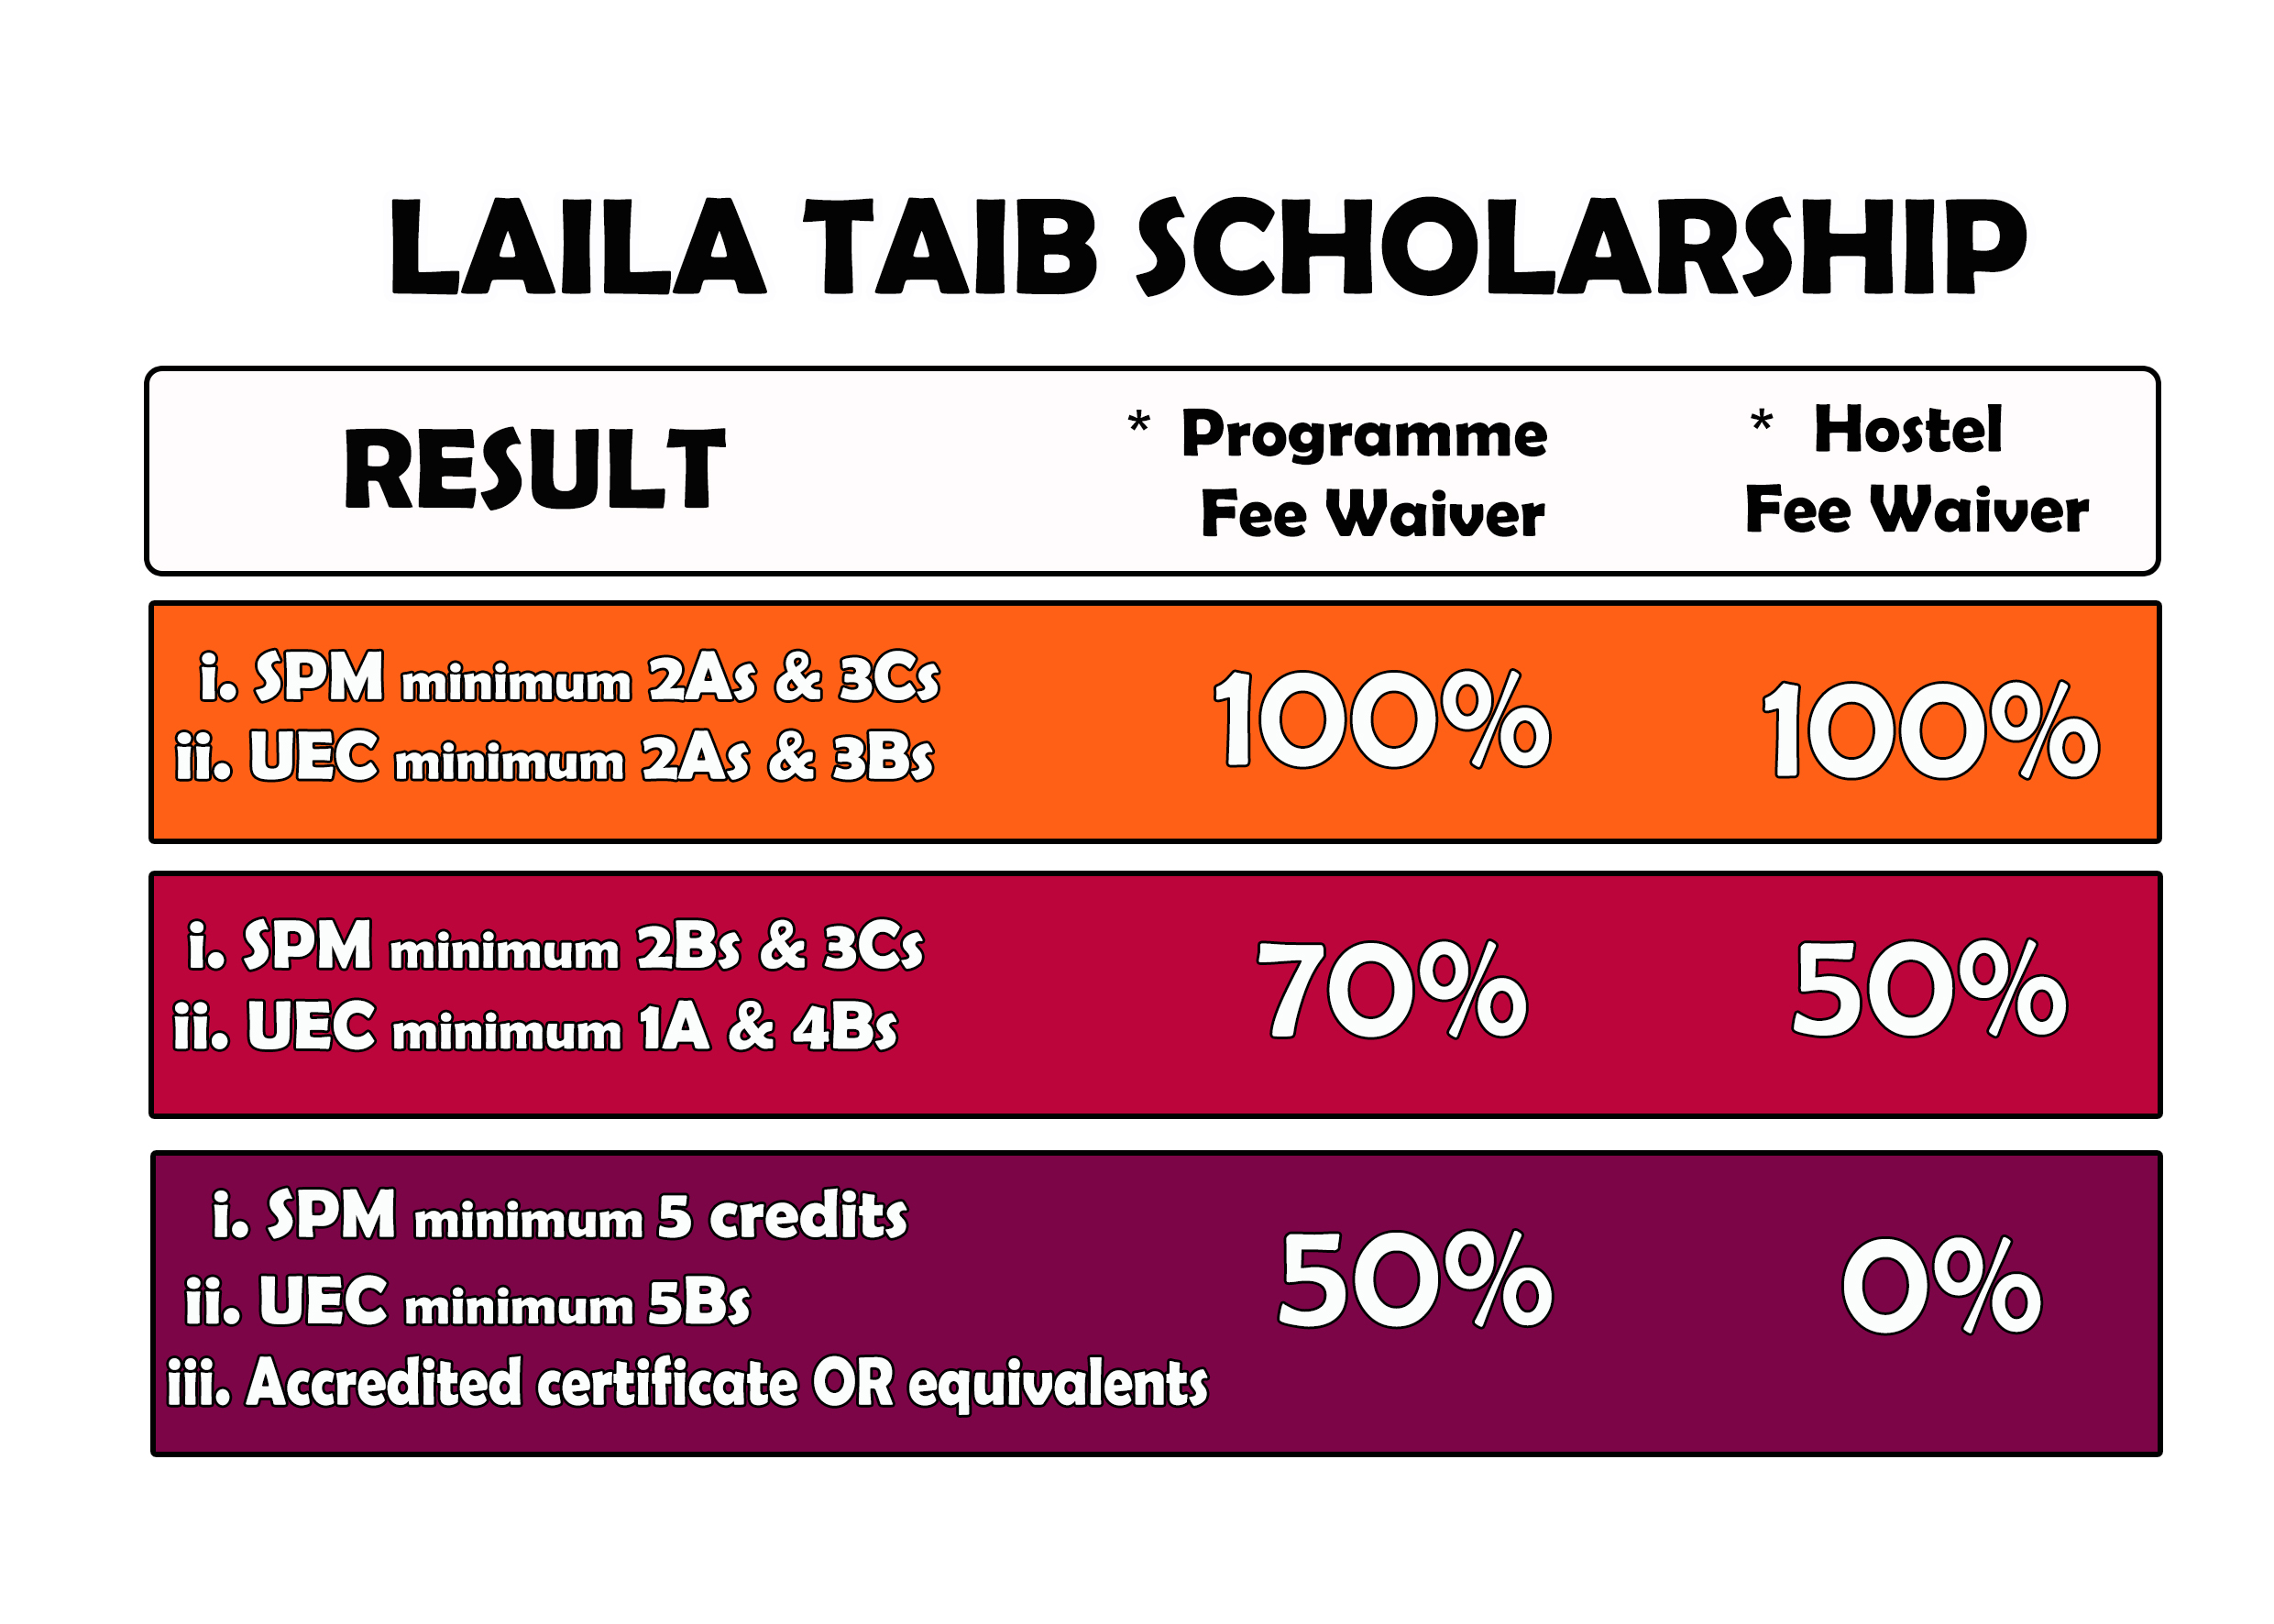 Laila Taib Scholarship